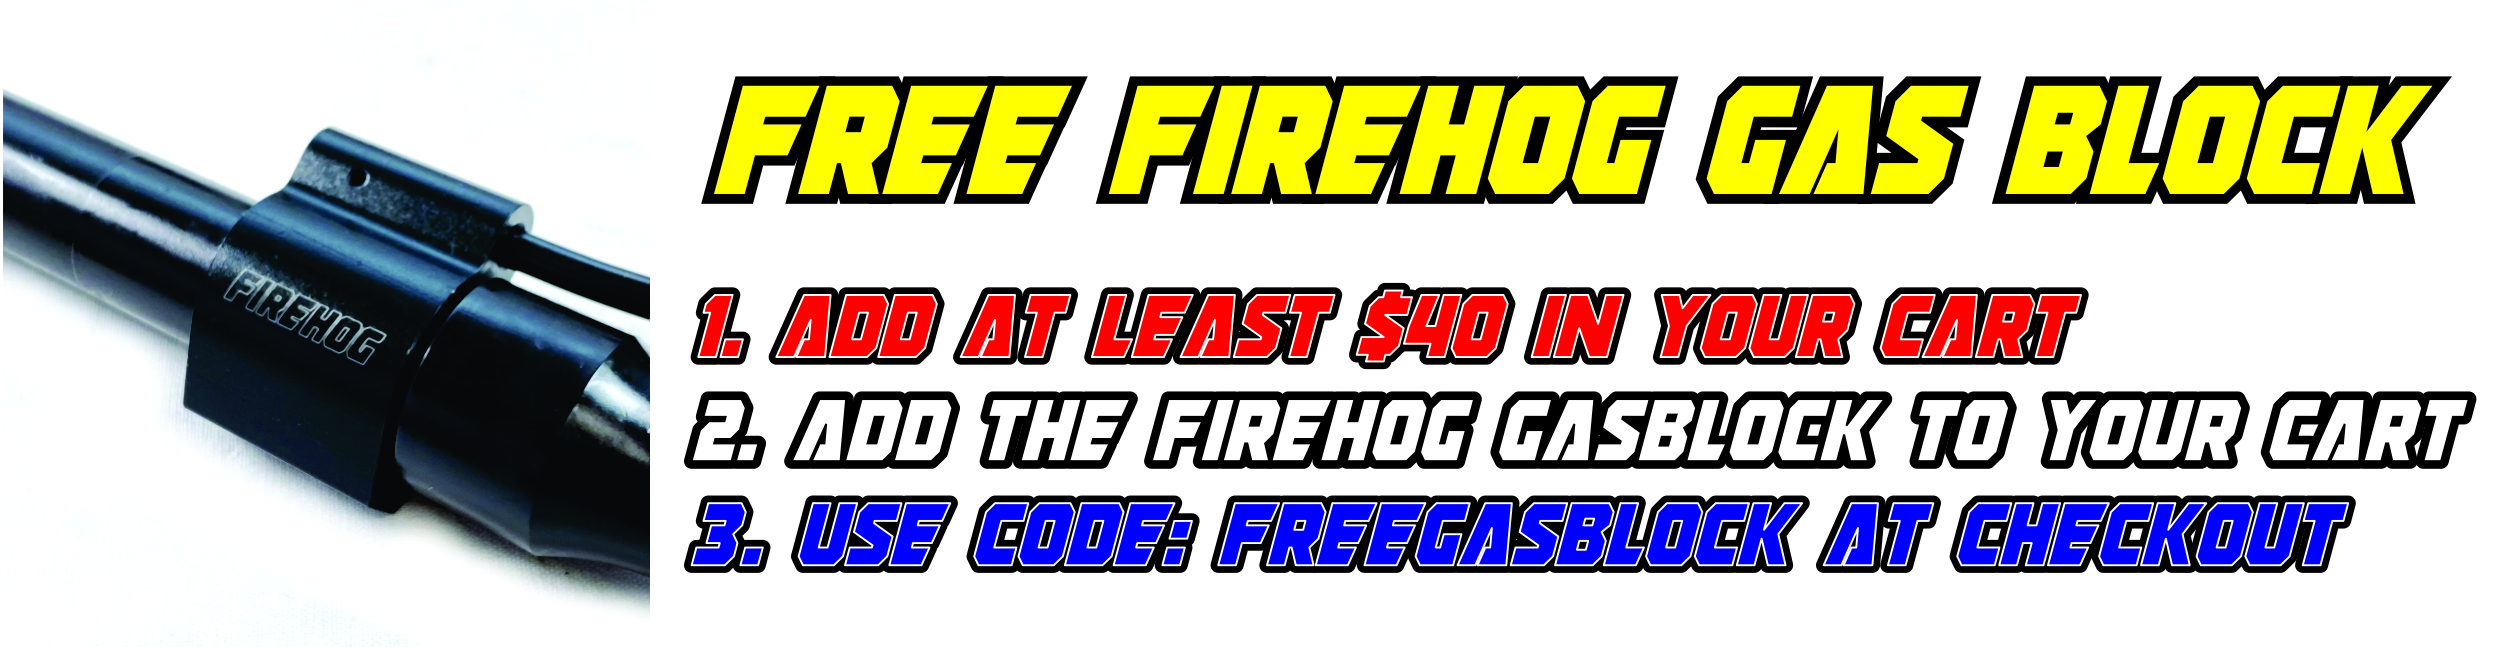 firehog-gas-block-promo-banner2.jpg